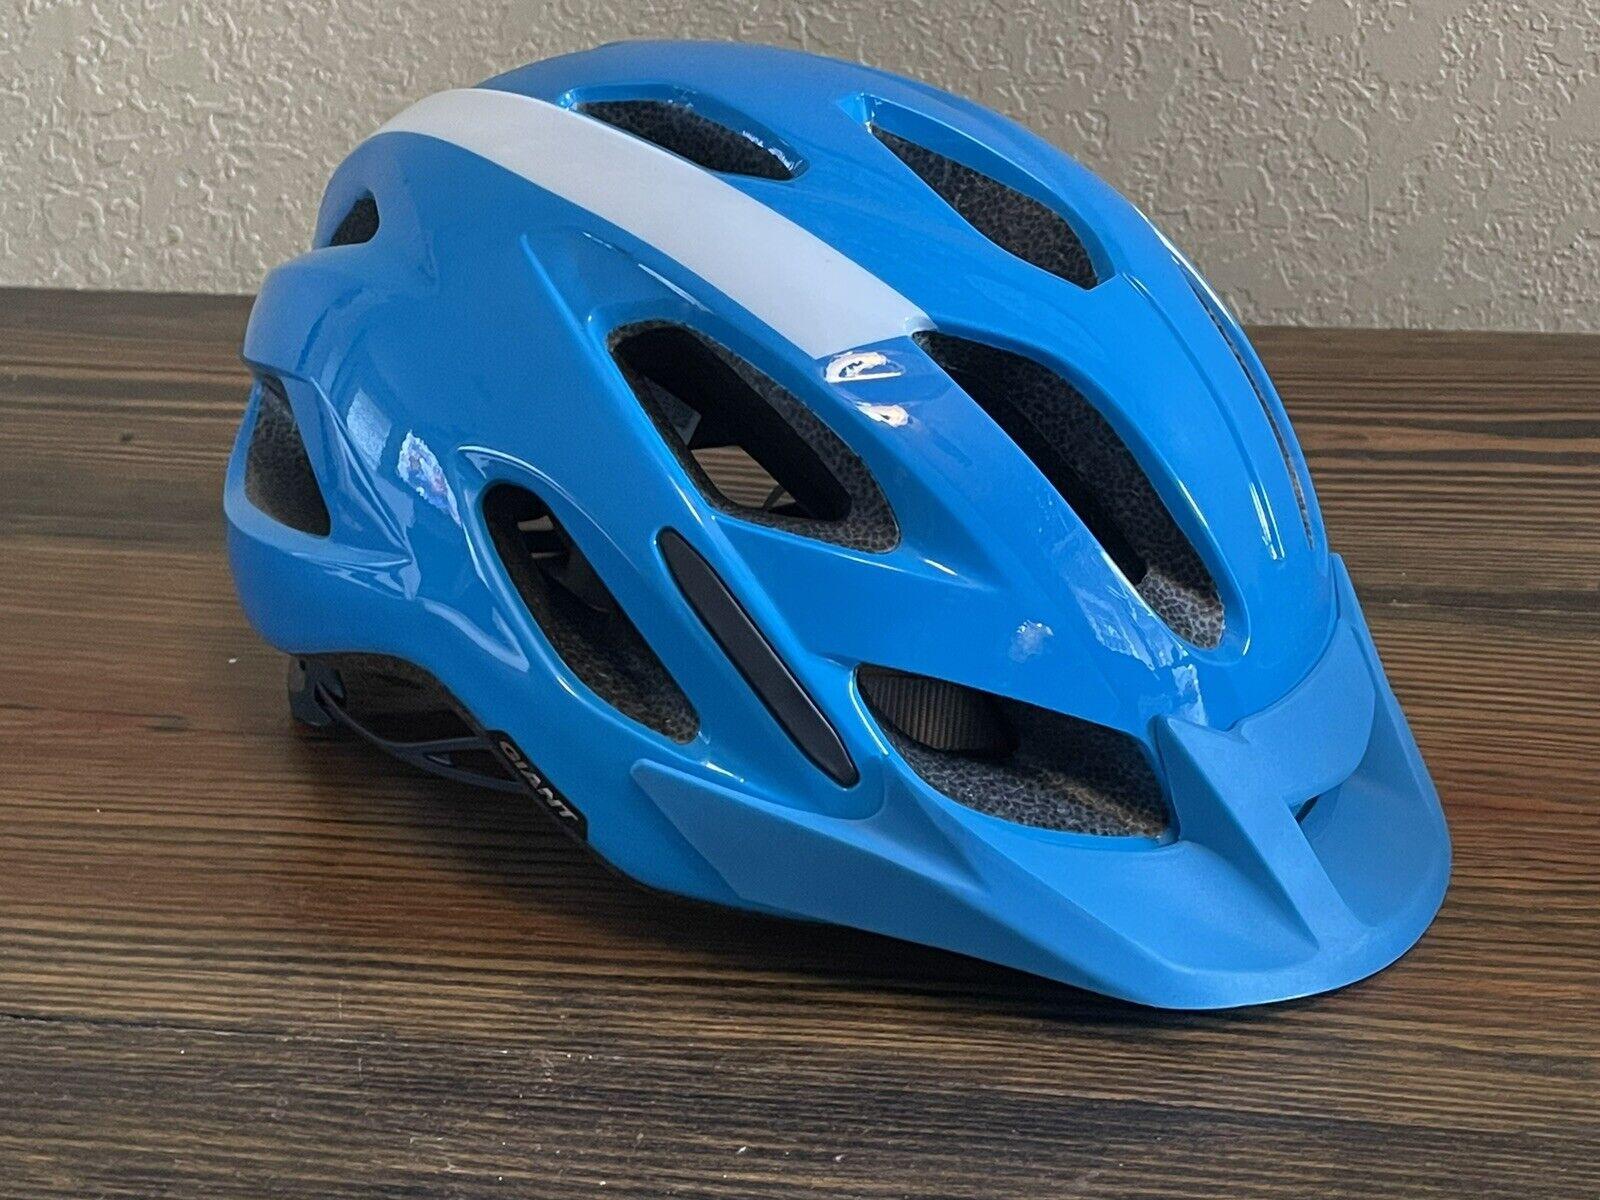 NEW IN BOX GIANT COMPEL Bicycle Bike Helmet White Adult Medium-Large 53-61cm